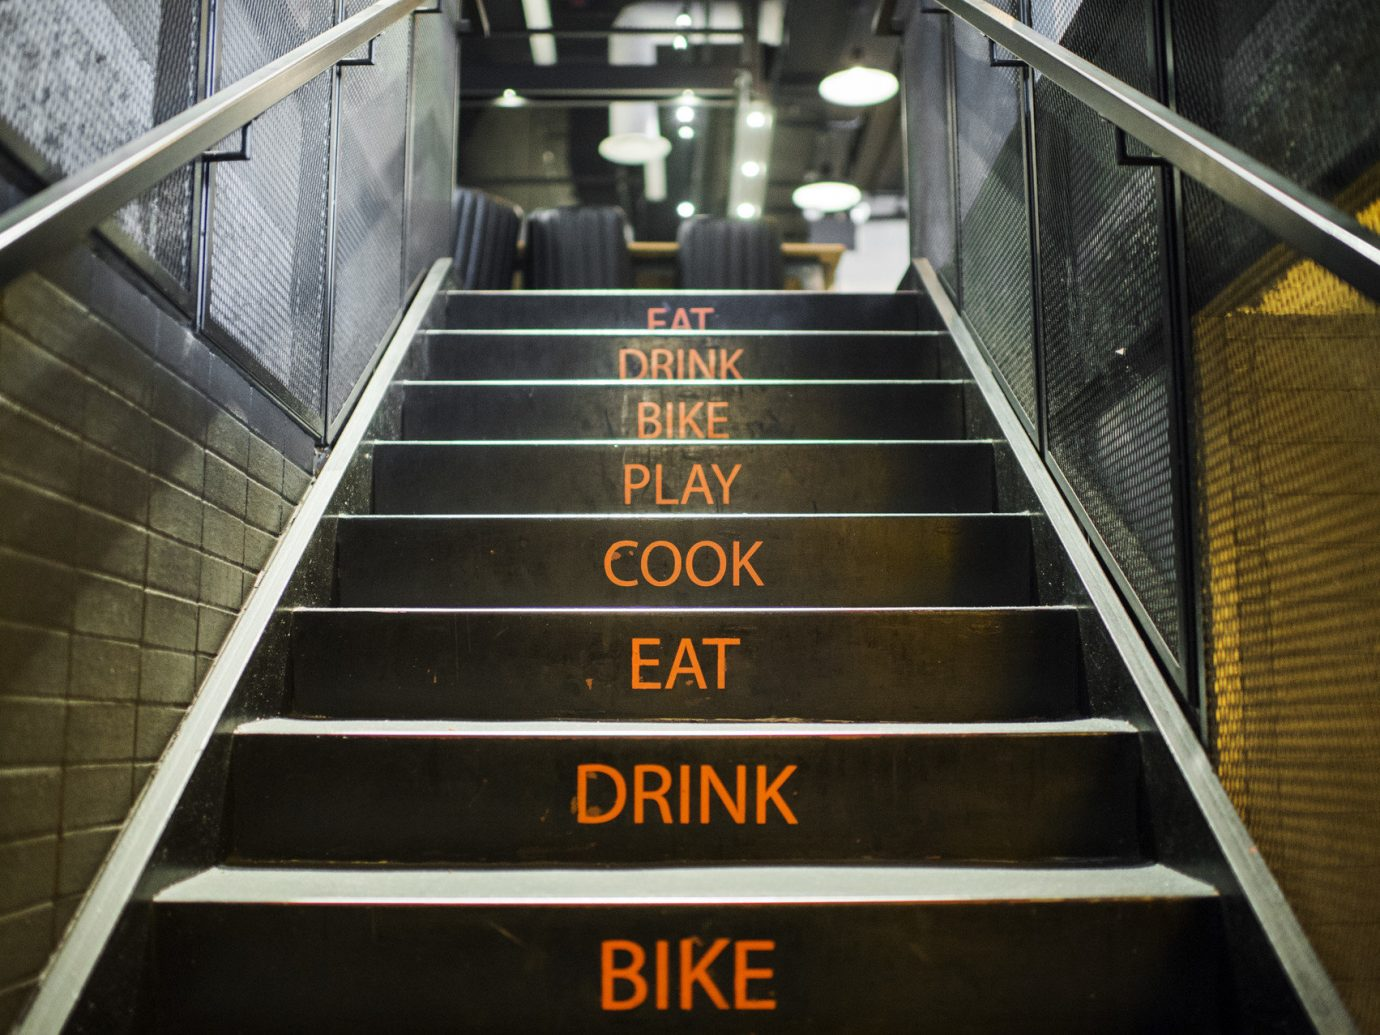 food court Hip industrial interior staircase trendy Trip Ideas urban escalator indoor transport metal public transport step